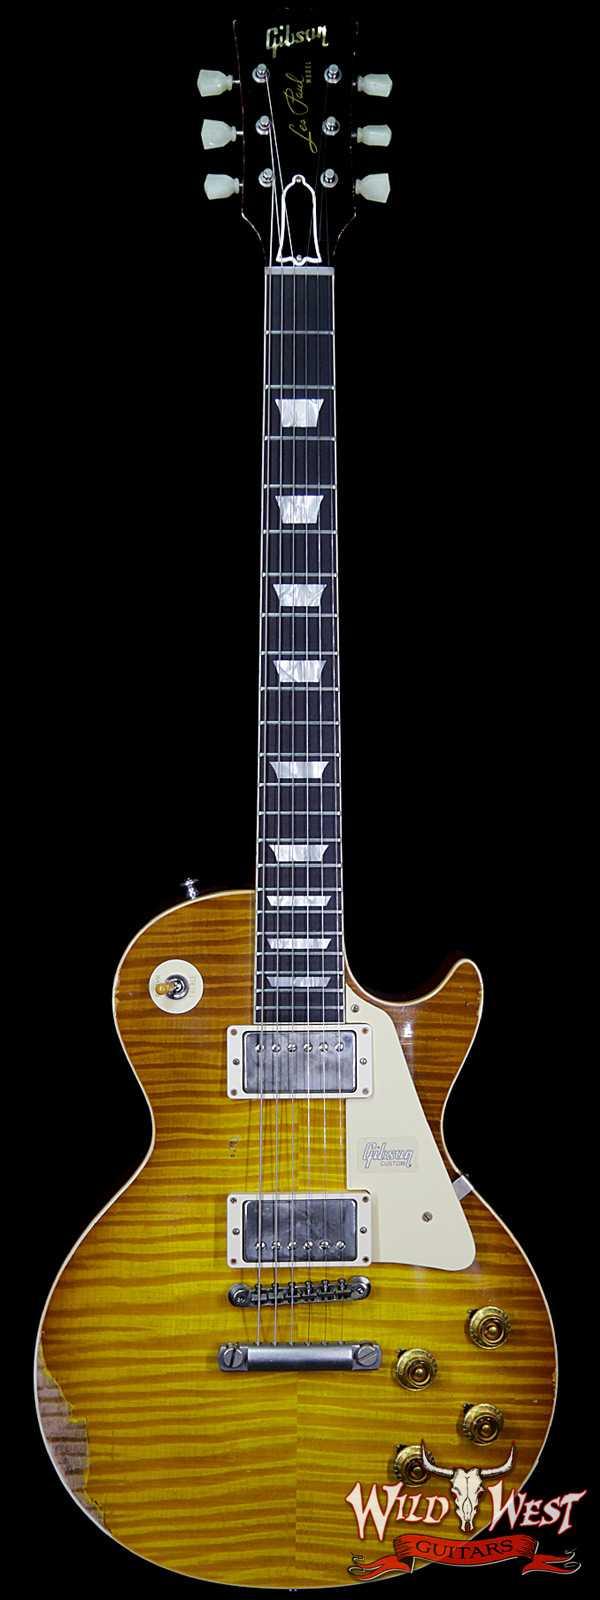 Gibson Custom Shop Historic 1959 Les Paul Heavy Aged Hand Selected Killer Top Brazilian Rosewood Board Honey Lemon Fade 8.35 Pounds